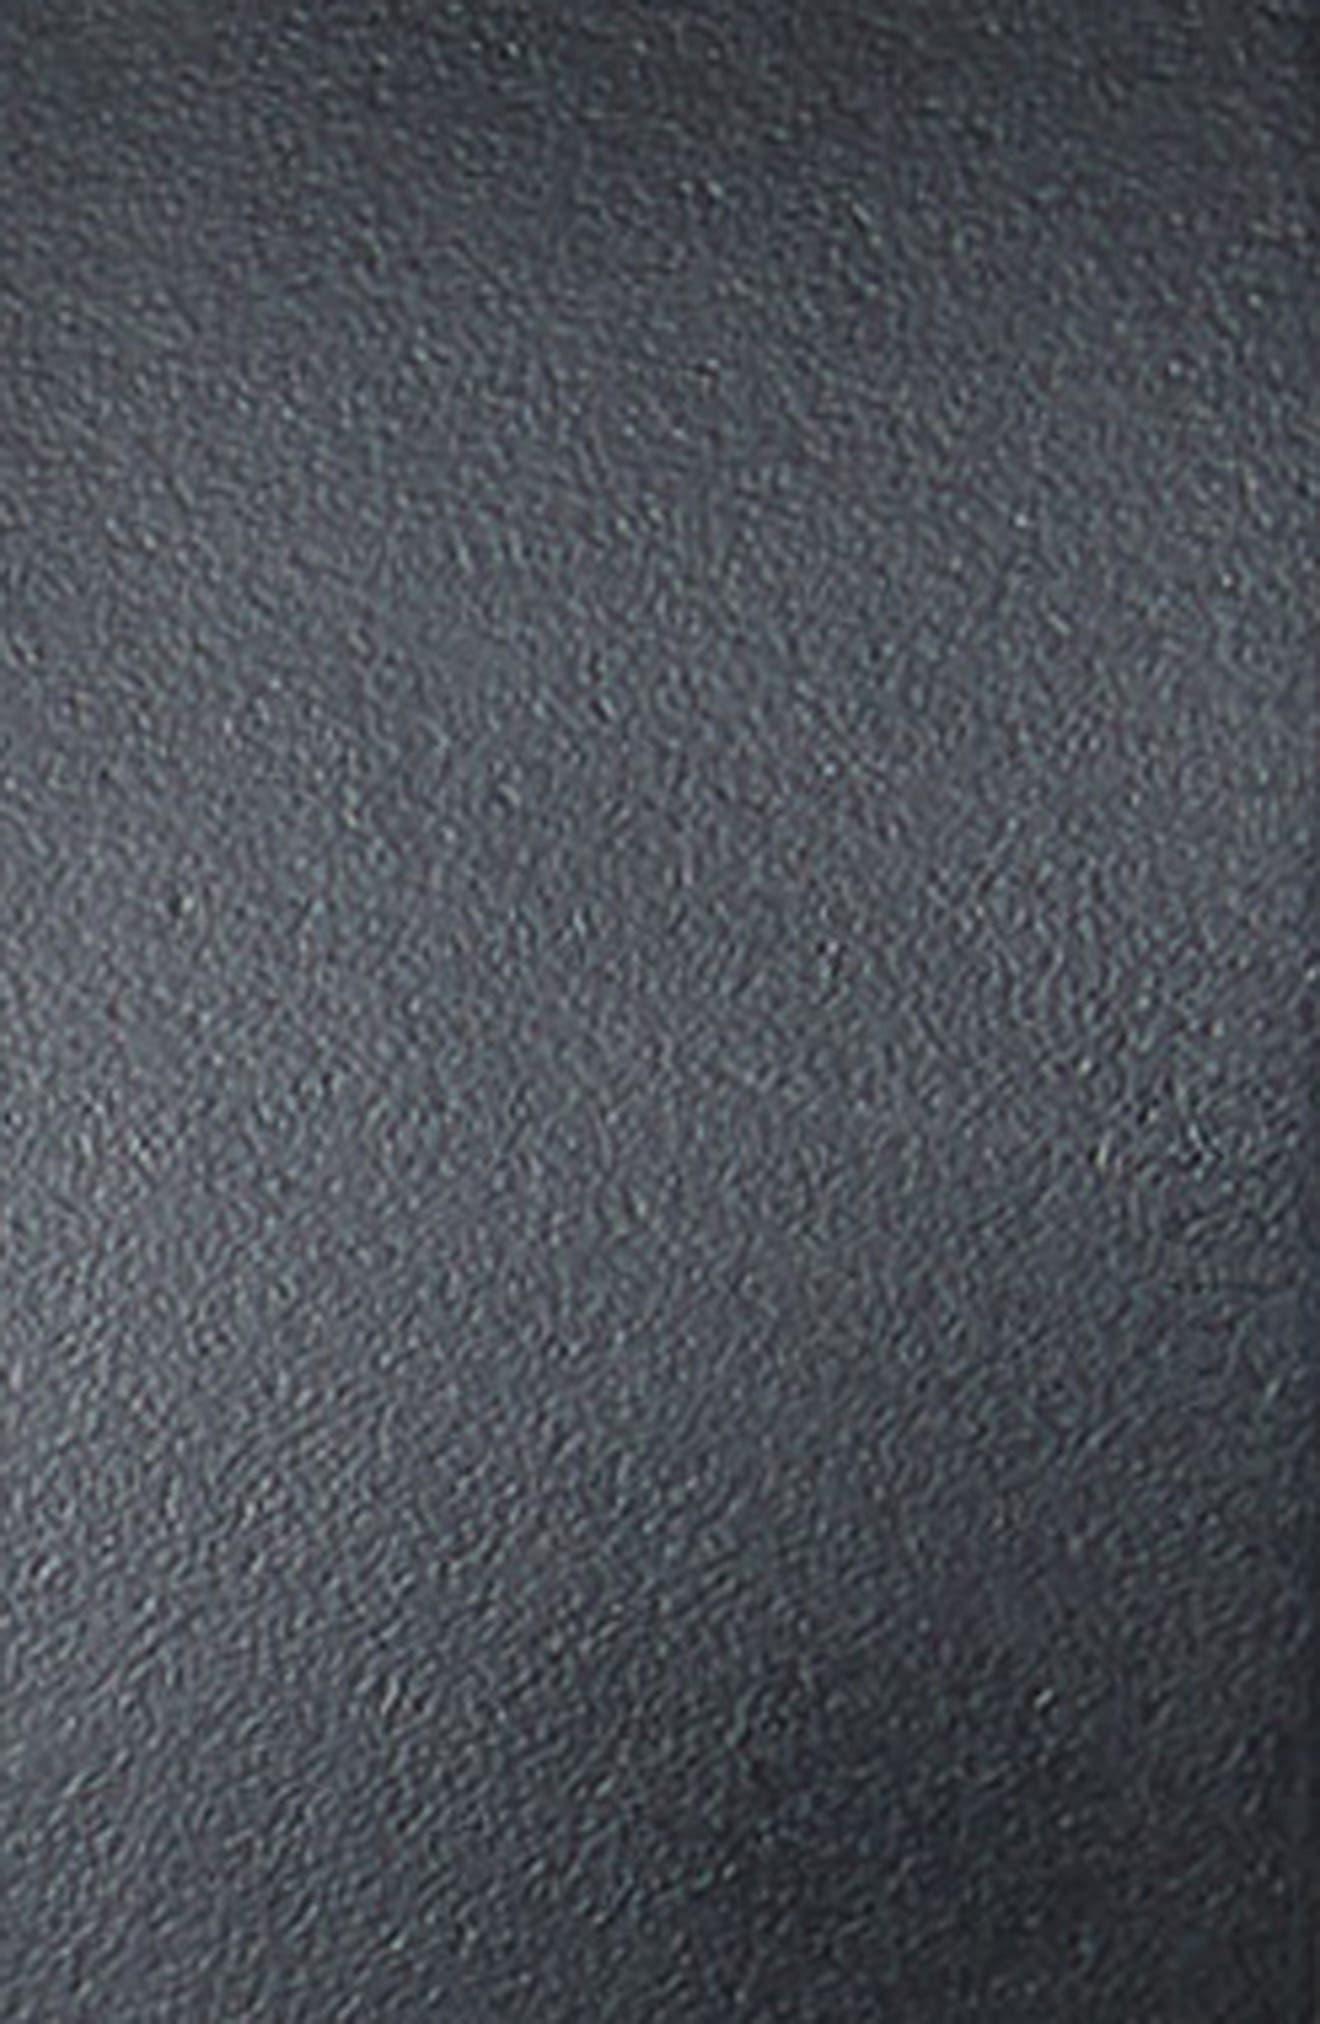 MICHAEL MICHAEL KORS,                             Calfskin Leather Belt,                             Alternate thumbnail 3, color,                             BLACK